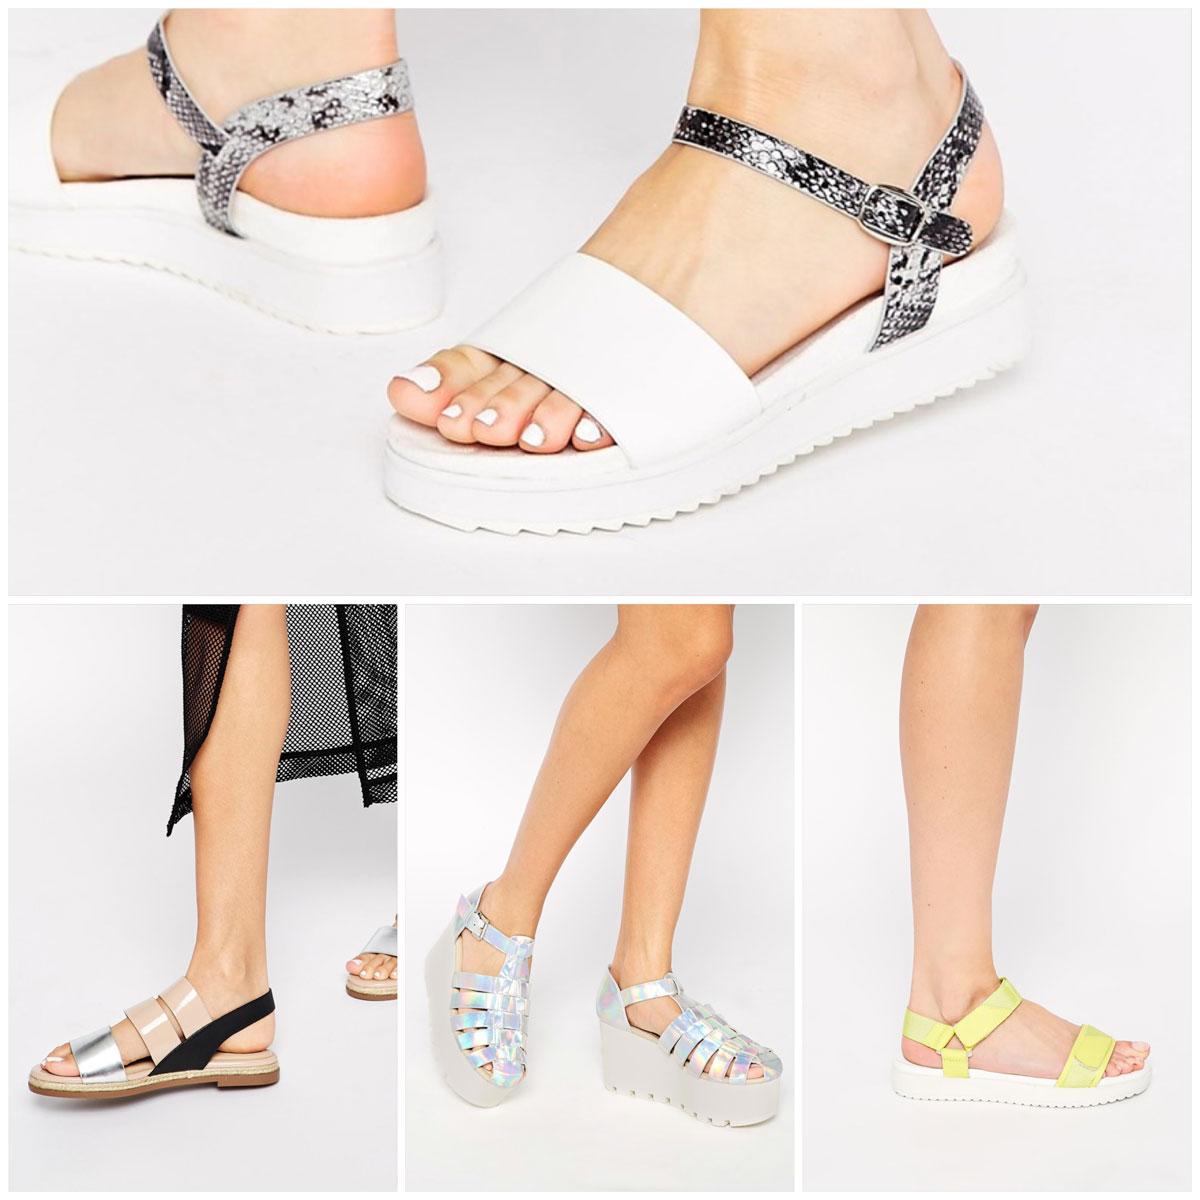 Summer Sandals Asos Fashion Style Platform Summer 2016 2015 Trend Inspiration Pastel Cool Trendy